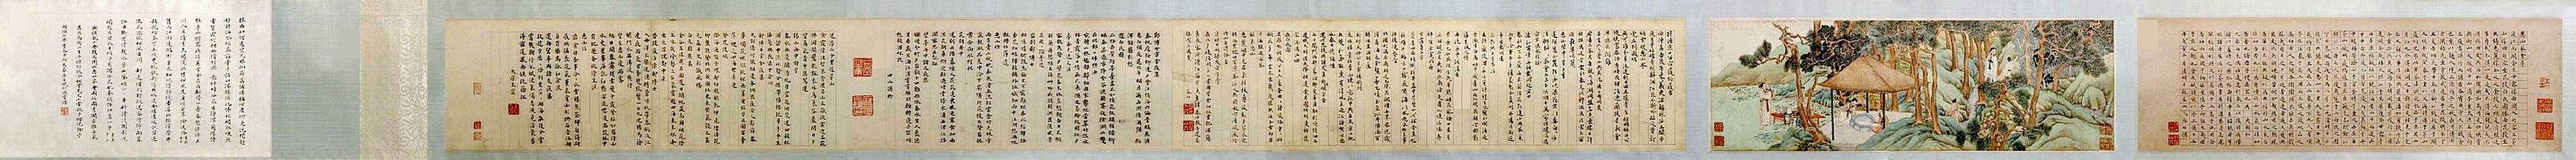 History of tea - Wikipedia